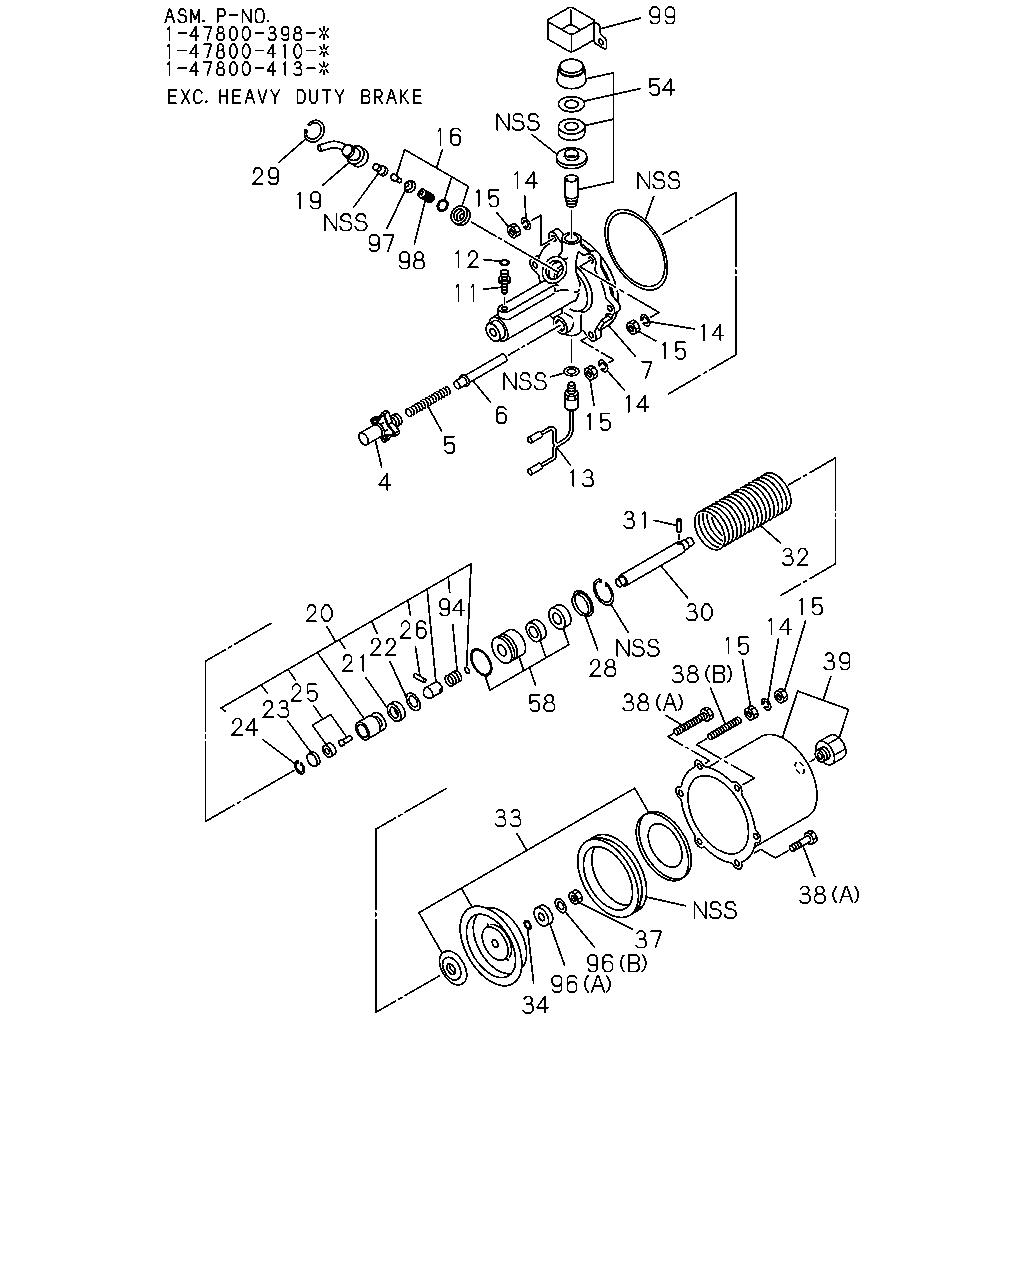 F&G, 10625 - FSR-LHD 93 - 95, 3 - Brakes, Brake System, 3-33 - AIR